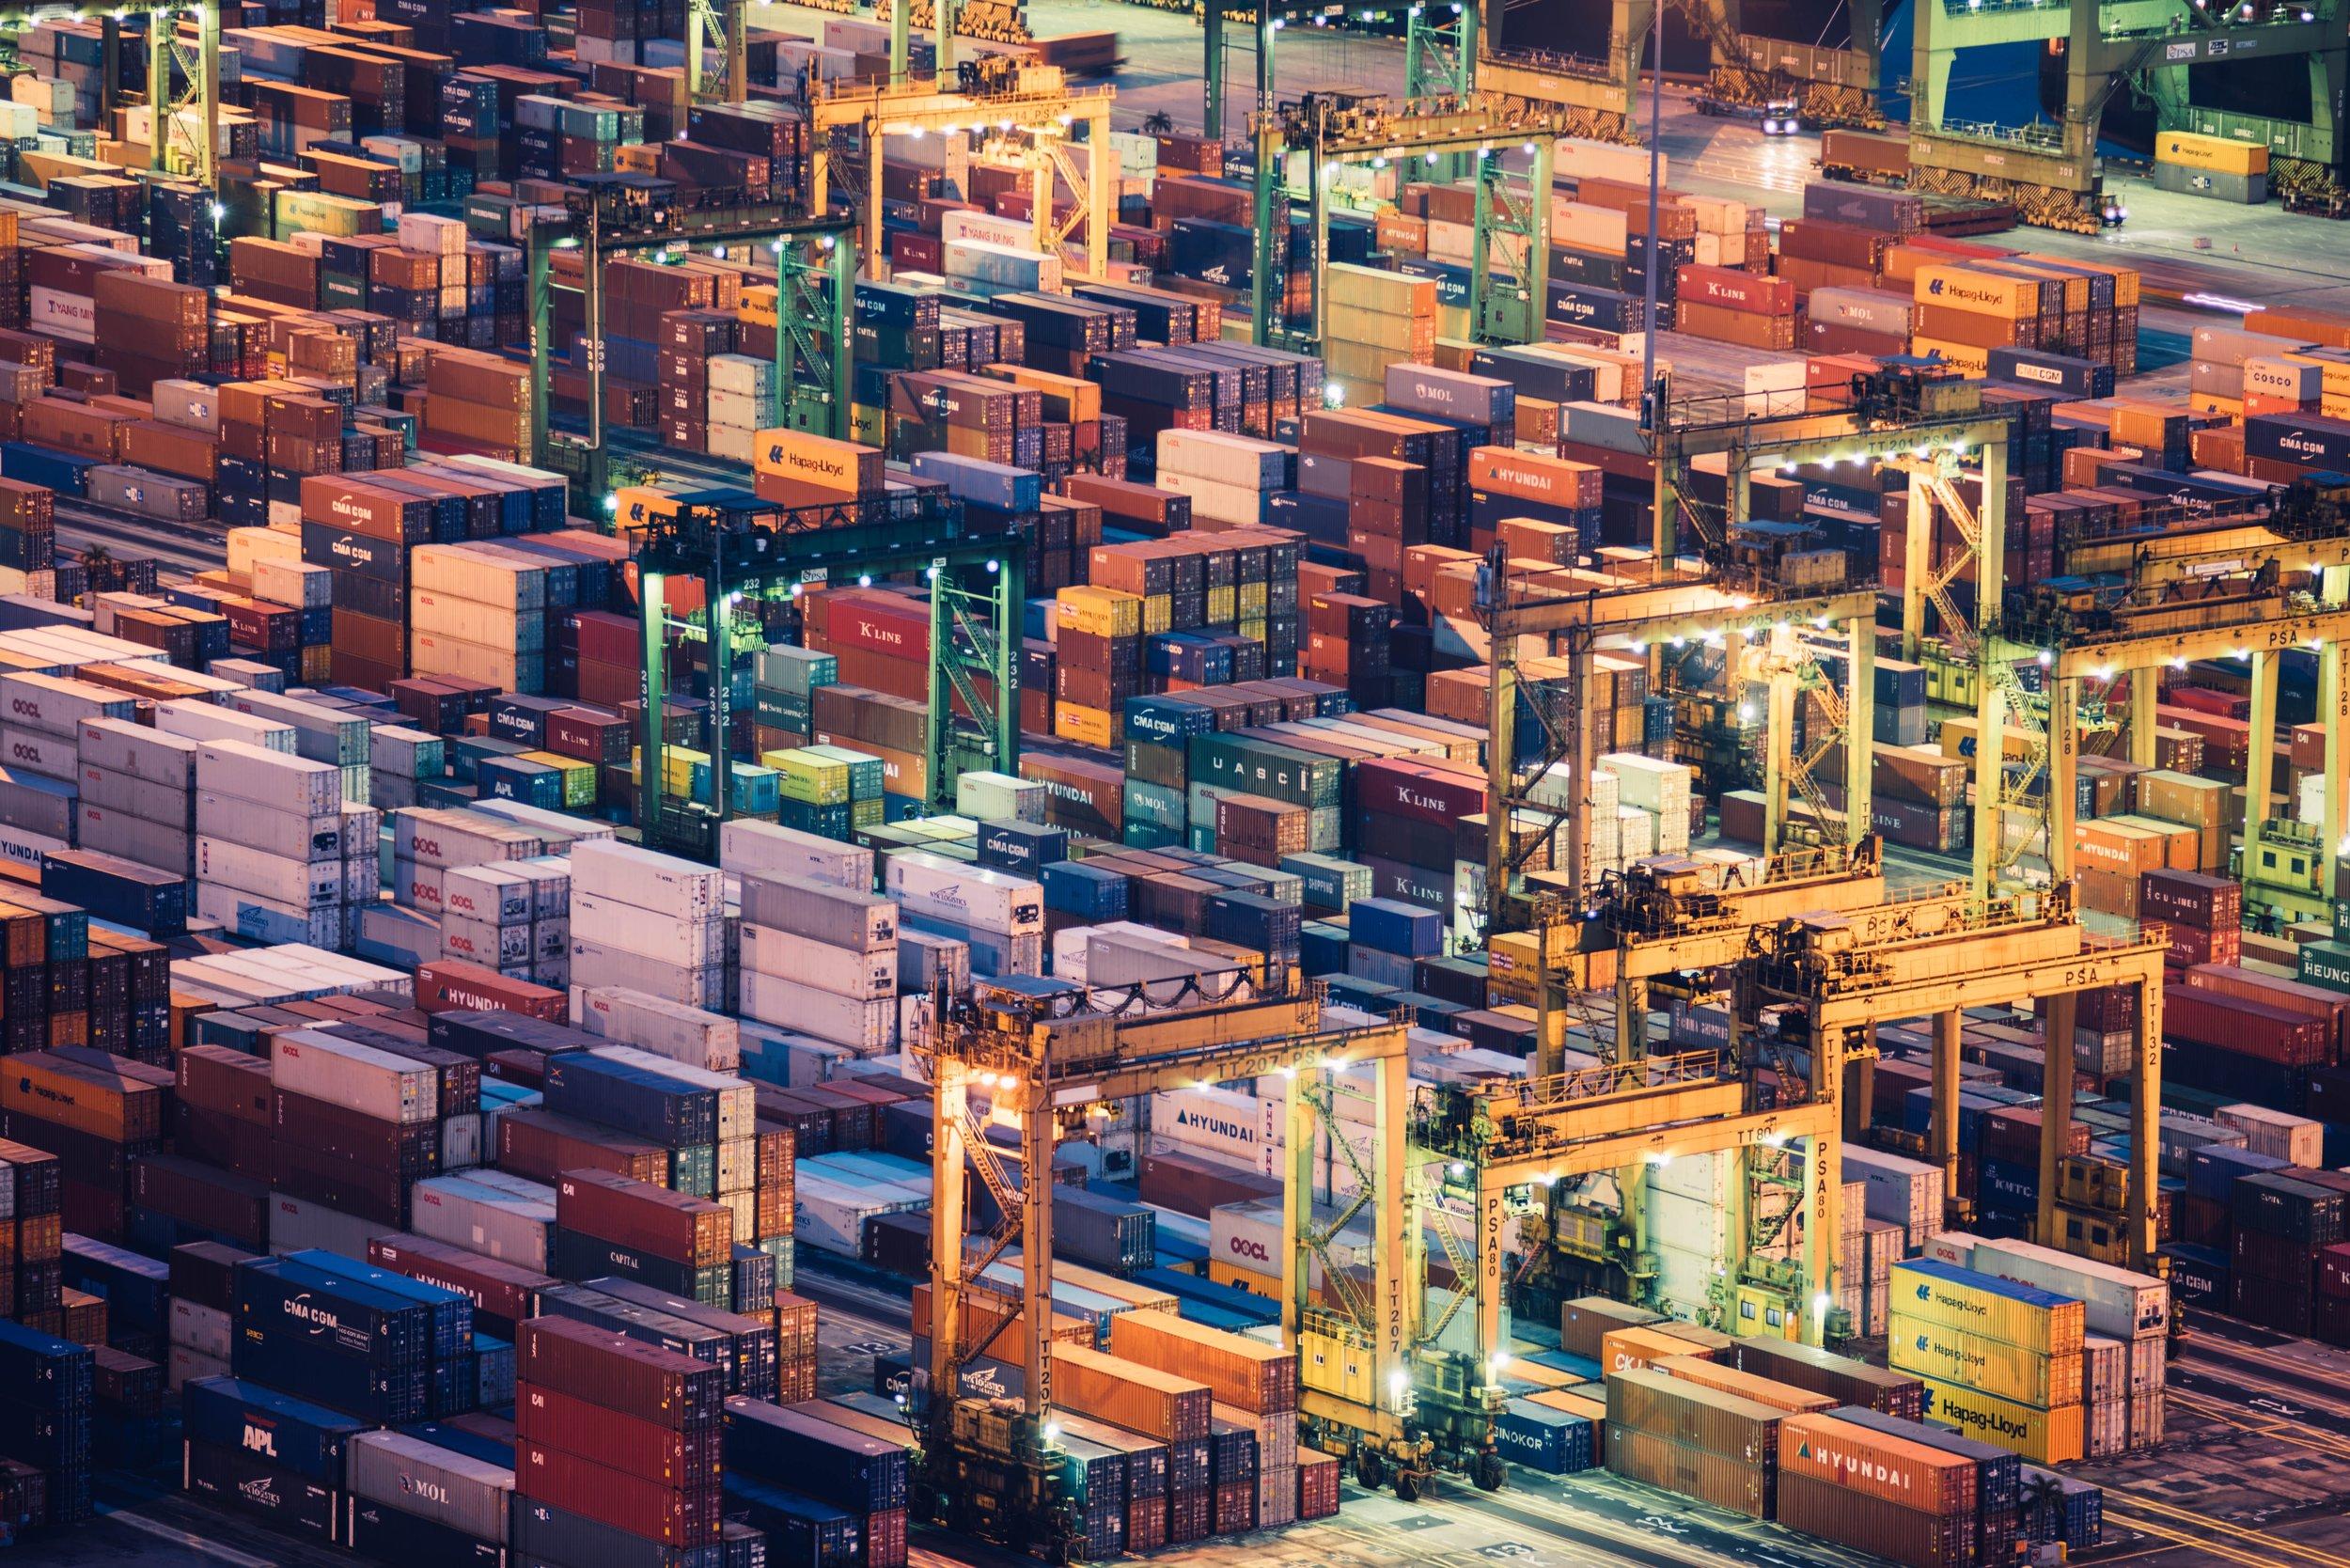 ariel containers chuttersnap-458795-unsplash.jpg